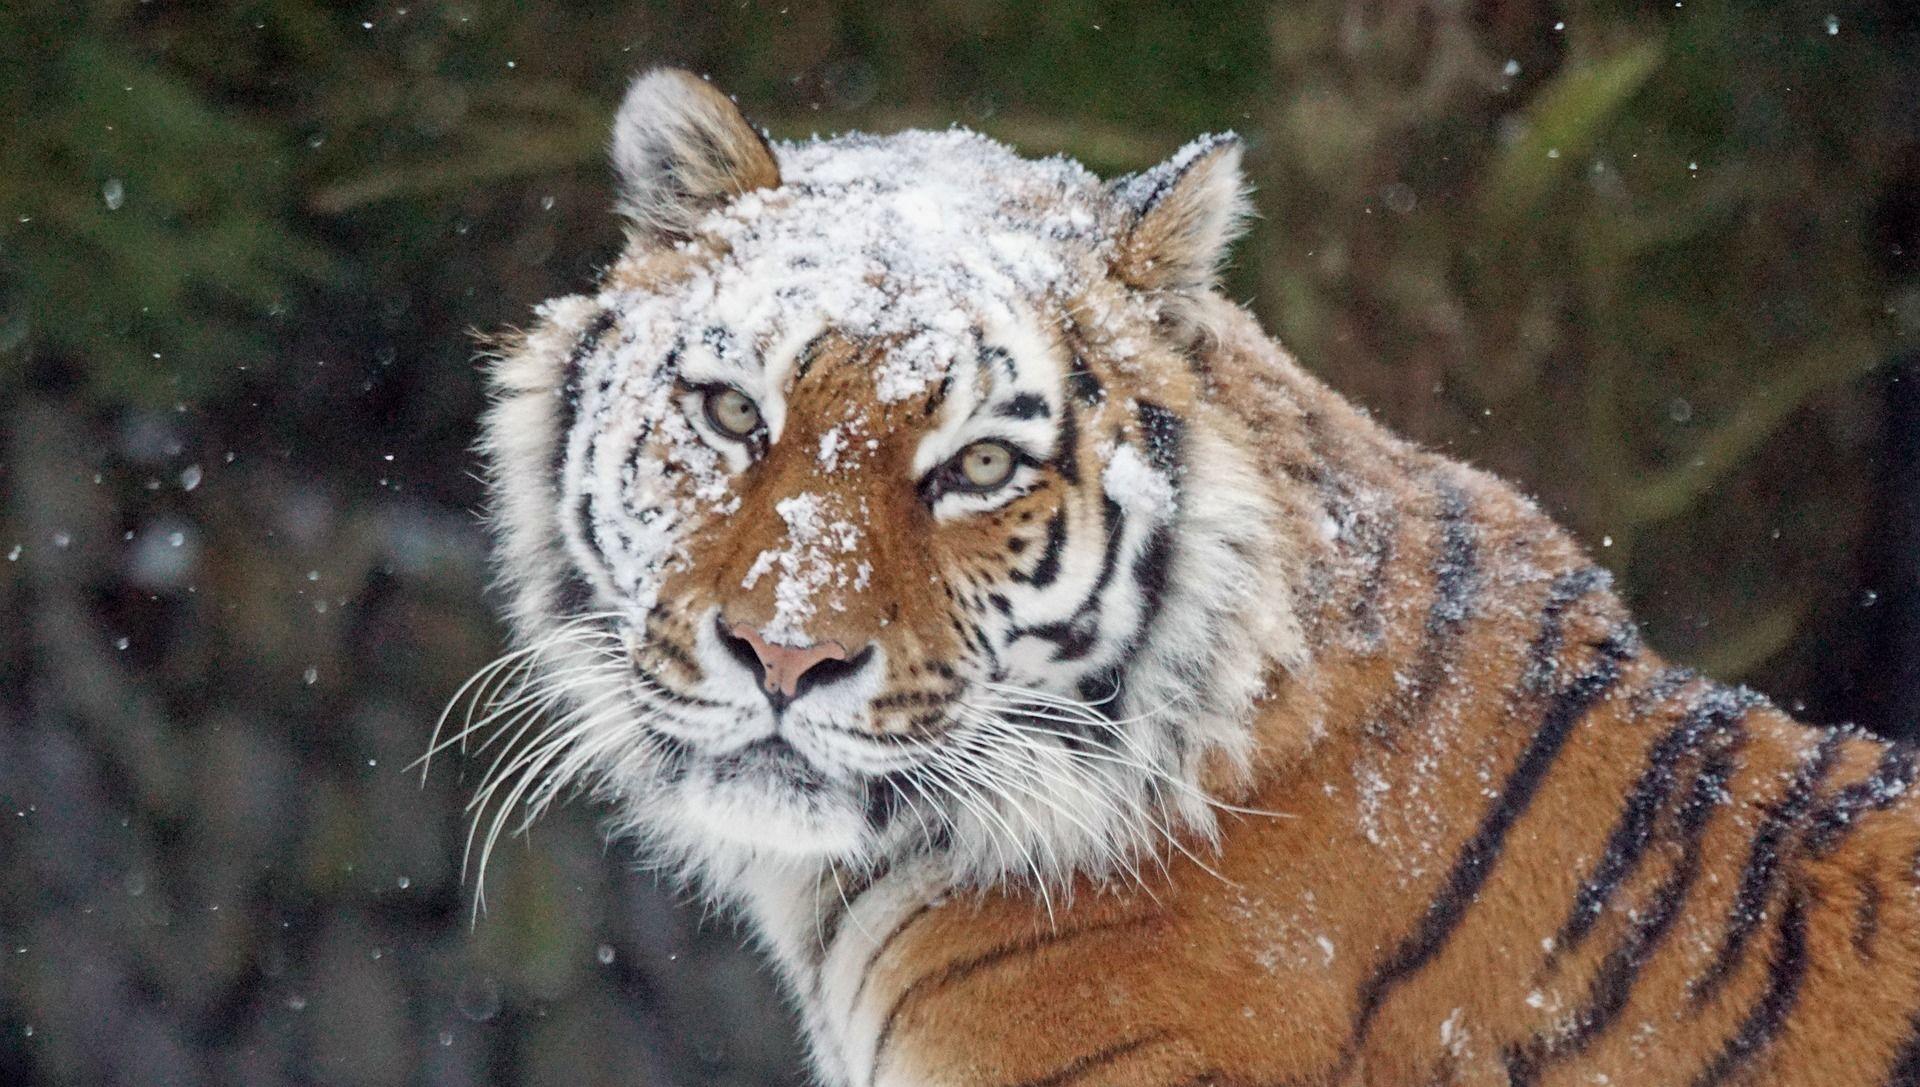 Un tigre en hiver - Sputnik France, 1920, 08.02.2021